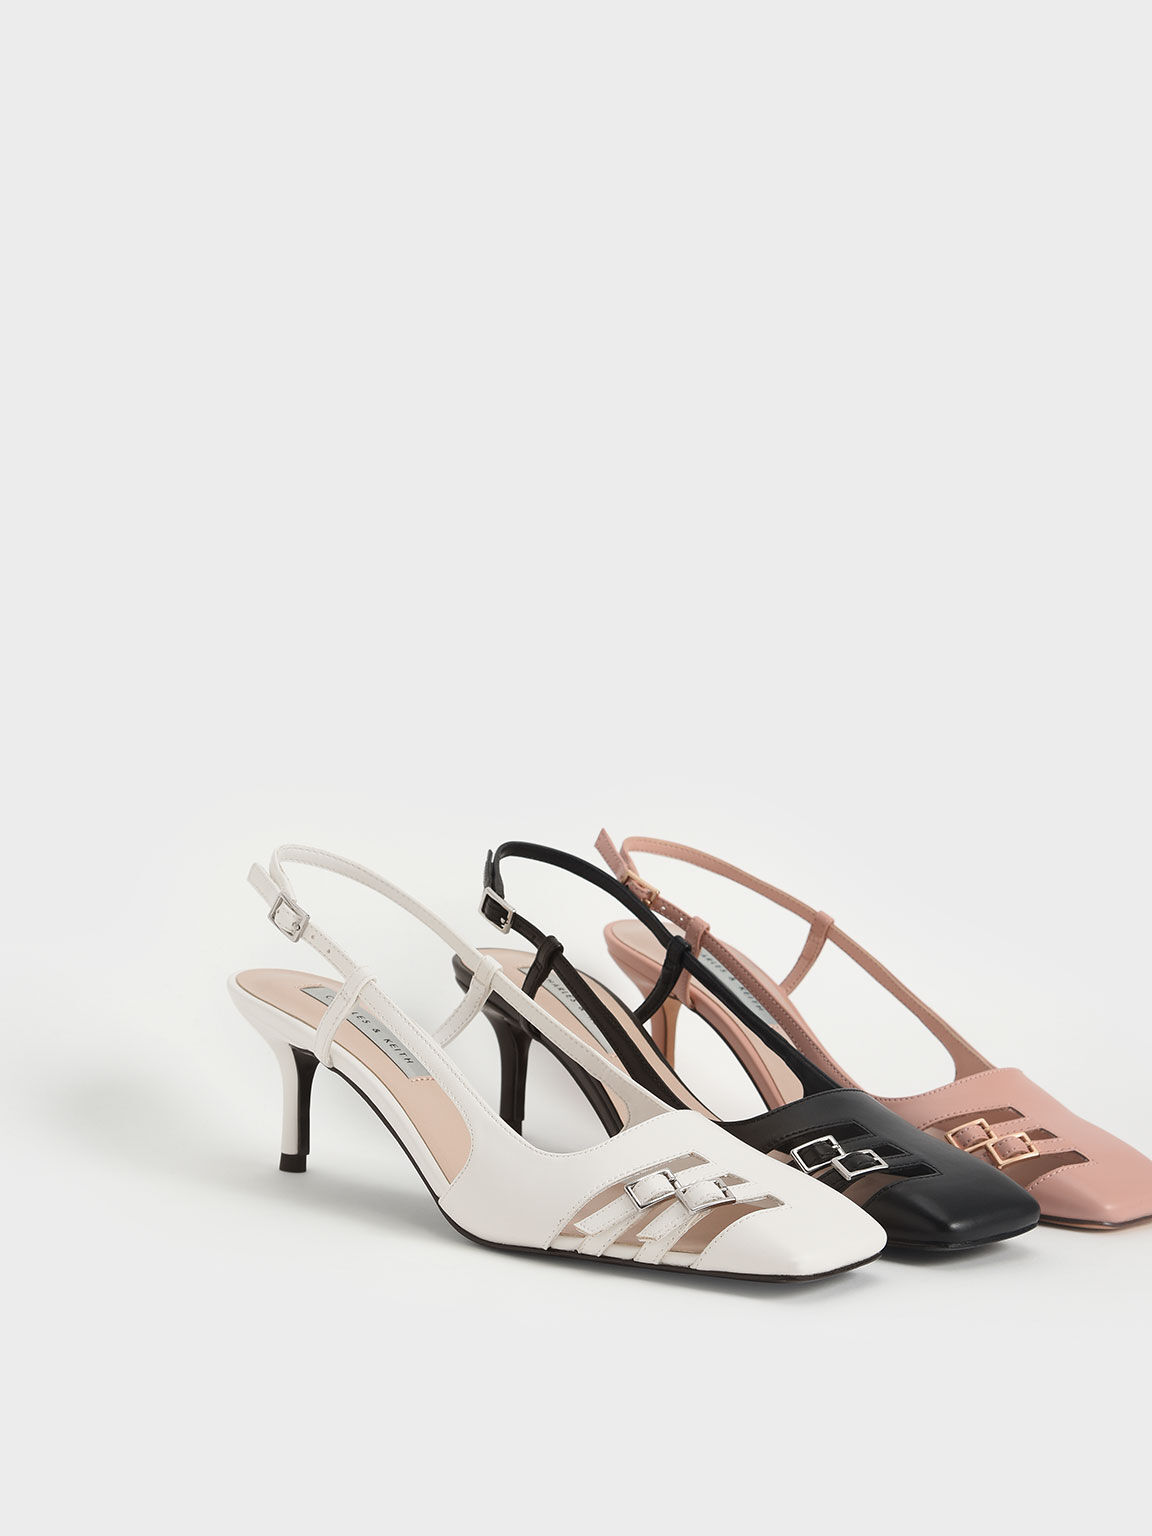 Cut-Out Buckled Slingback Court Shoes, Black, hi-res